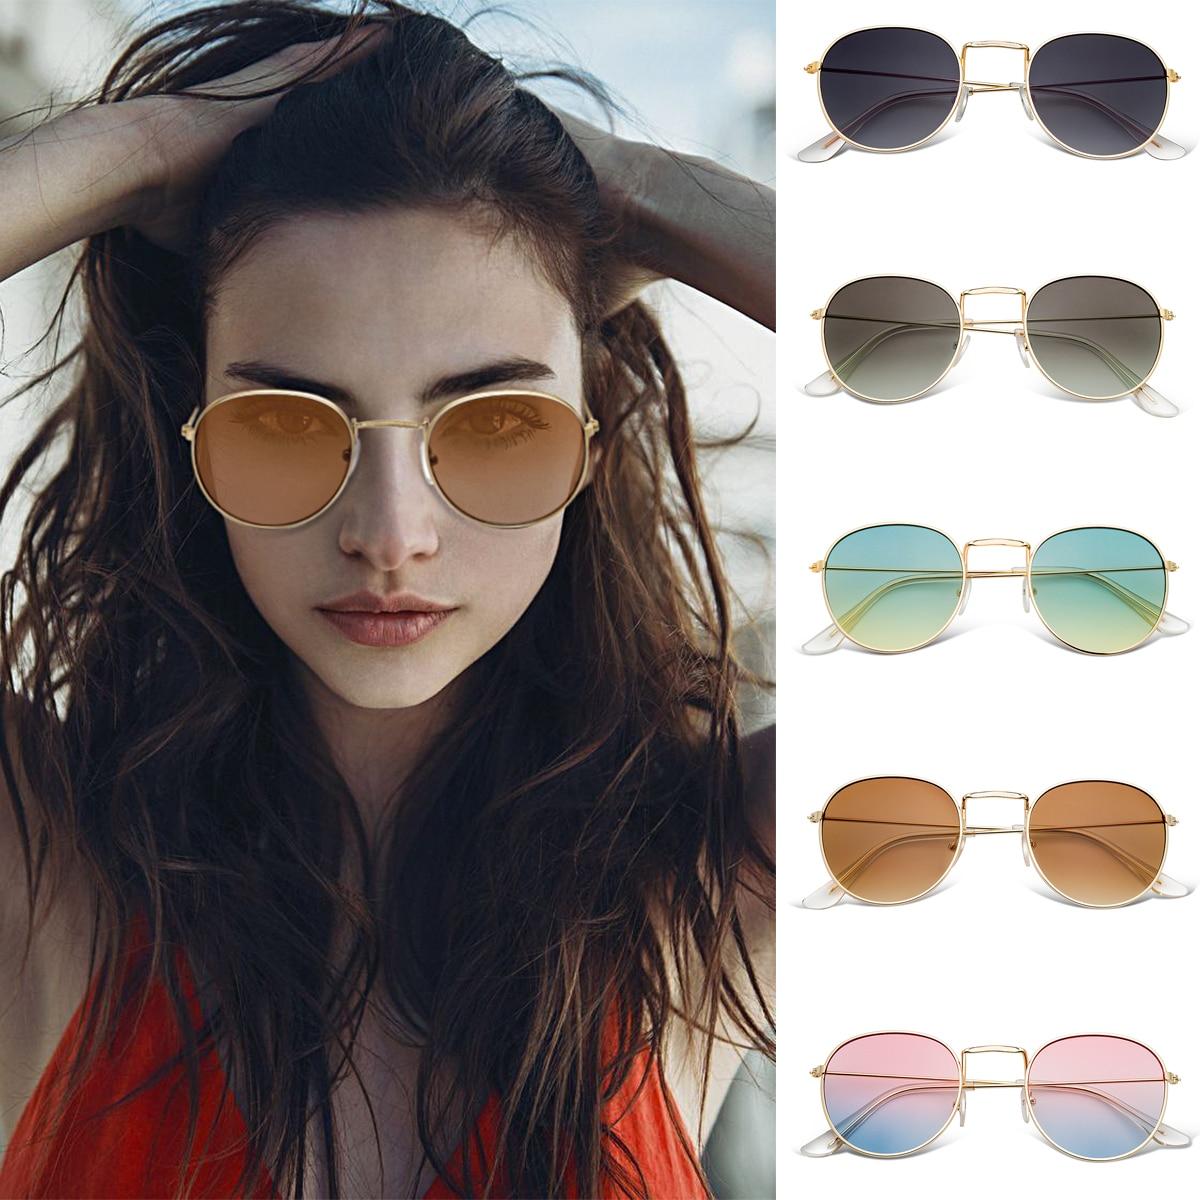 f17f60aaa7 Detail Feedback Questions about WISH CLUB Round Sunglasses For Women  Fashion Retro Sun Glasses Female Eyeglasses Unisex Men gafas de sol UV400  High Quality ...